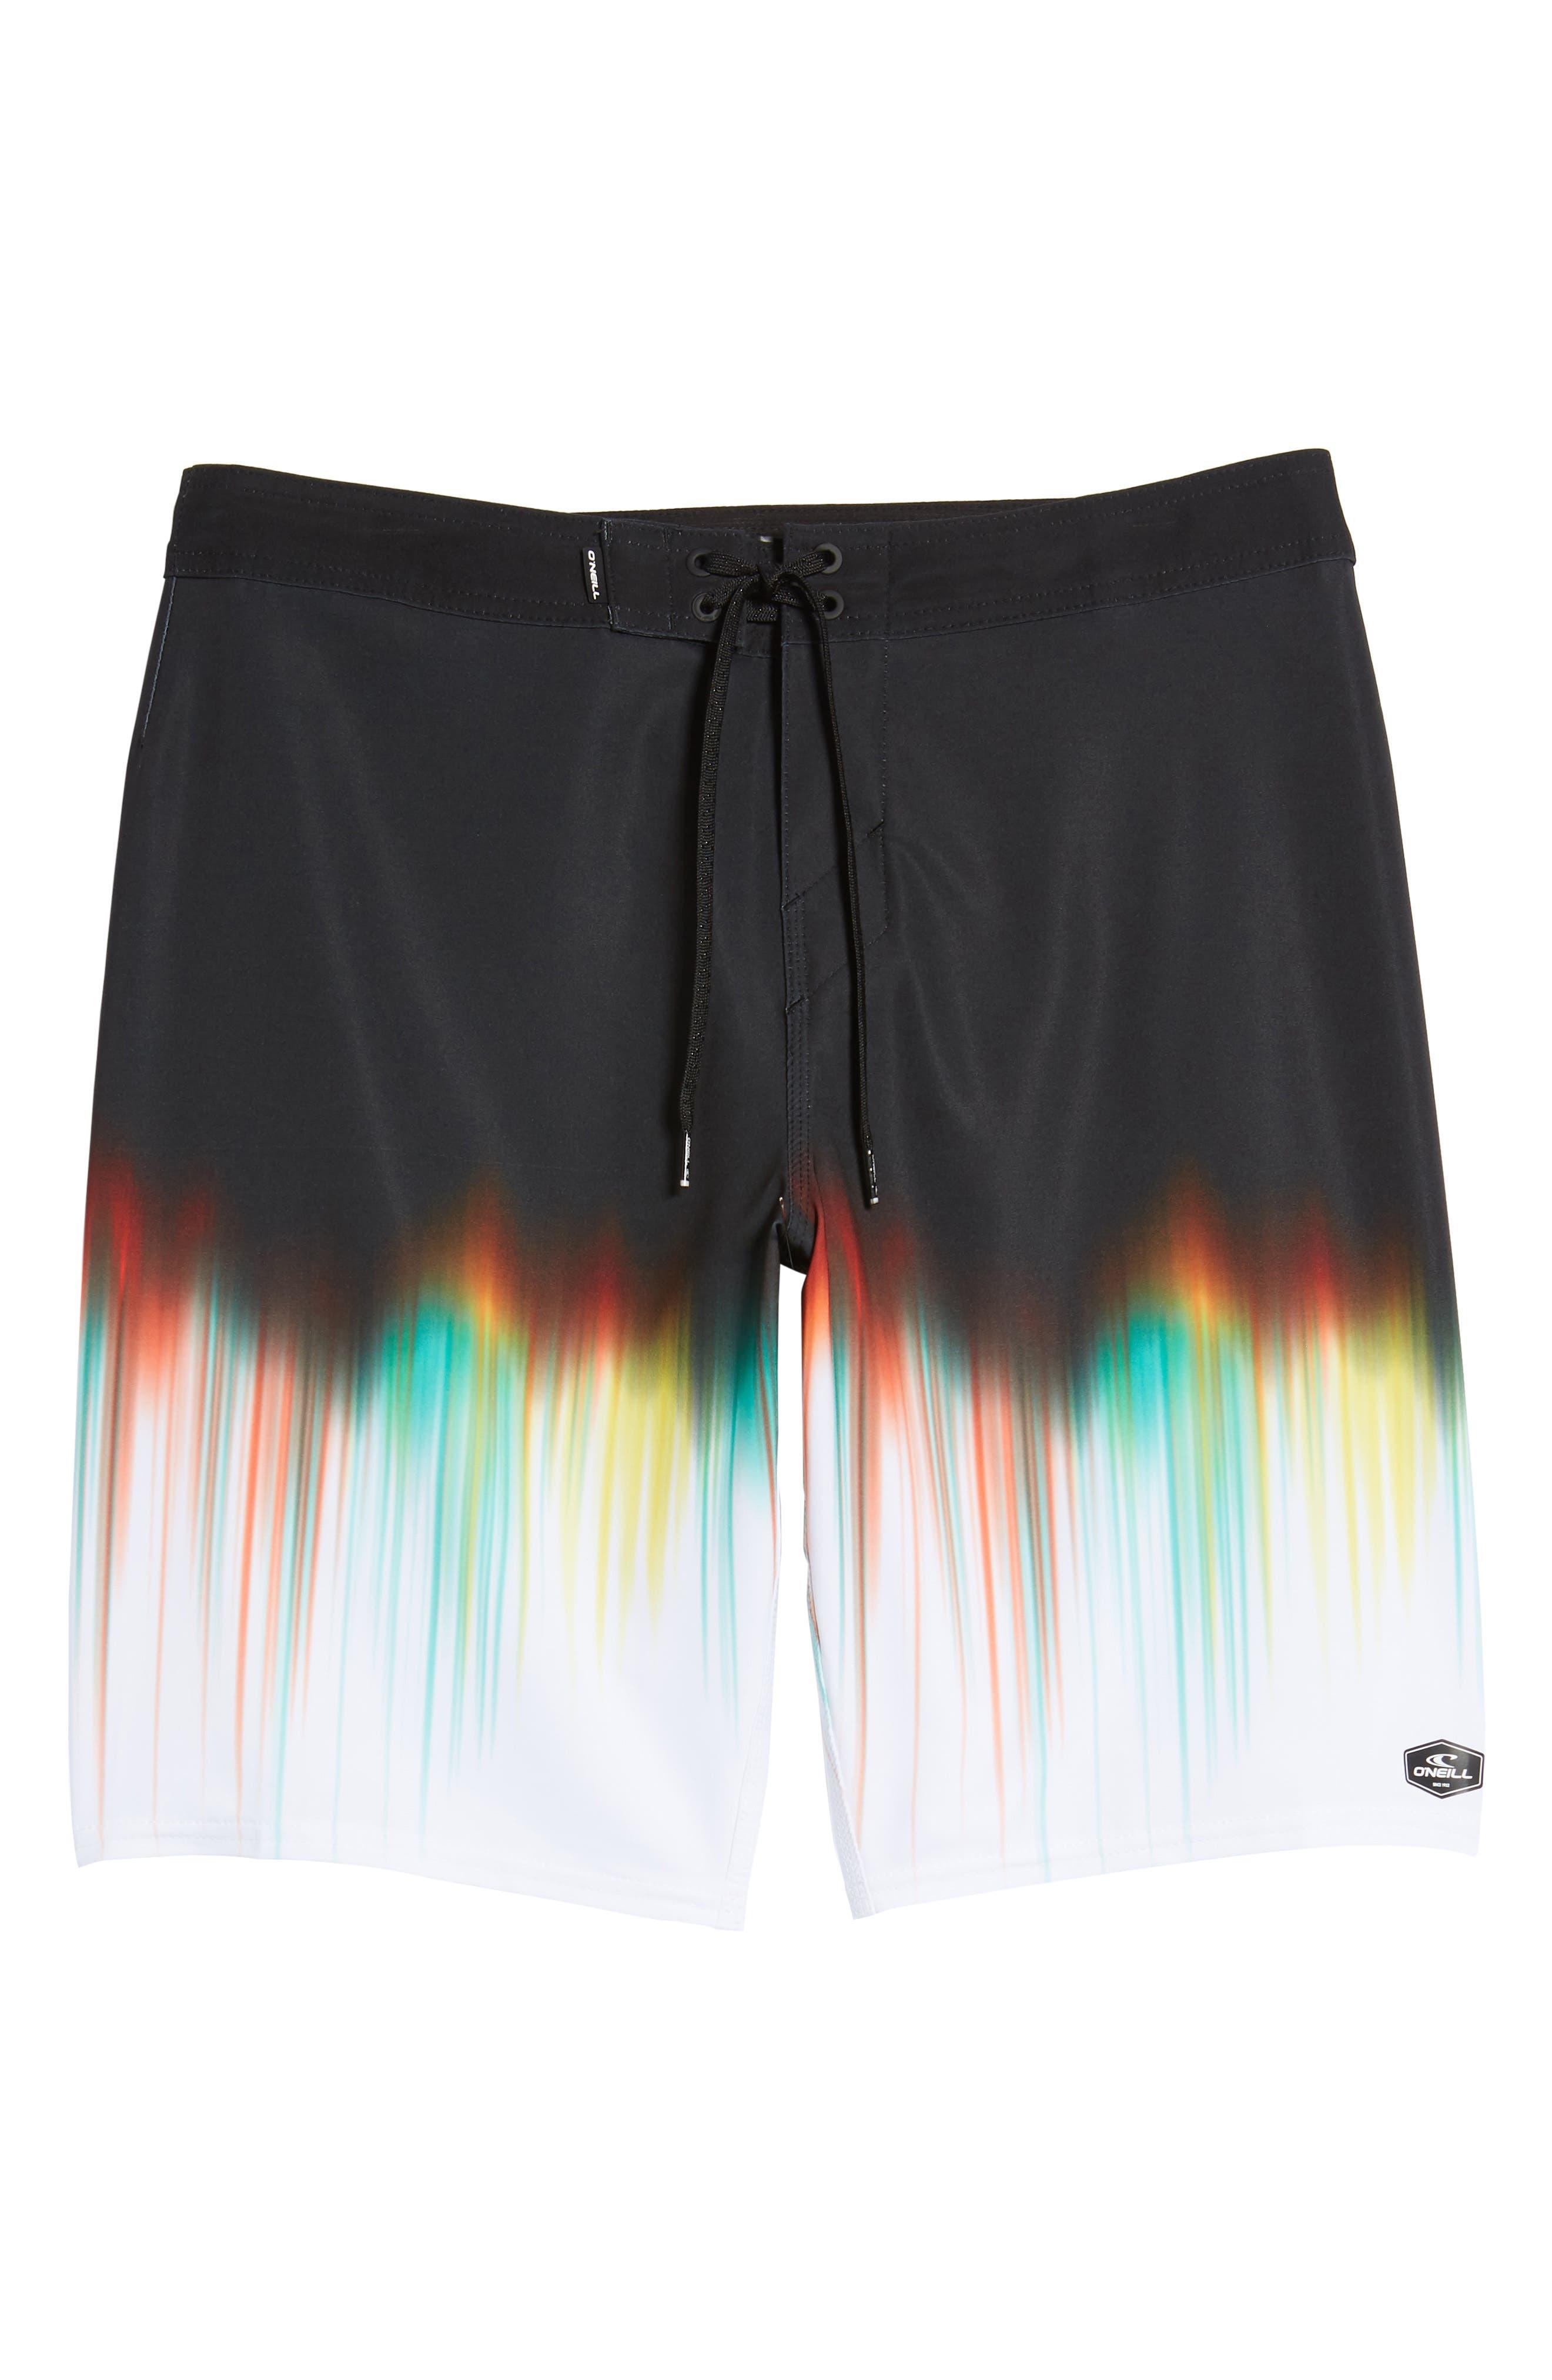 Hyperfreak Drippin' Board Shorts,                             Alternate thumbnail 6, color,                             Black